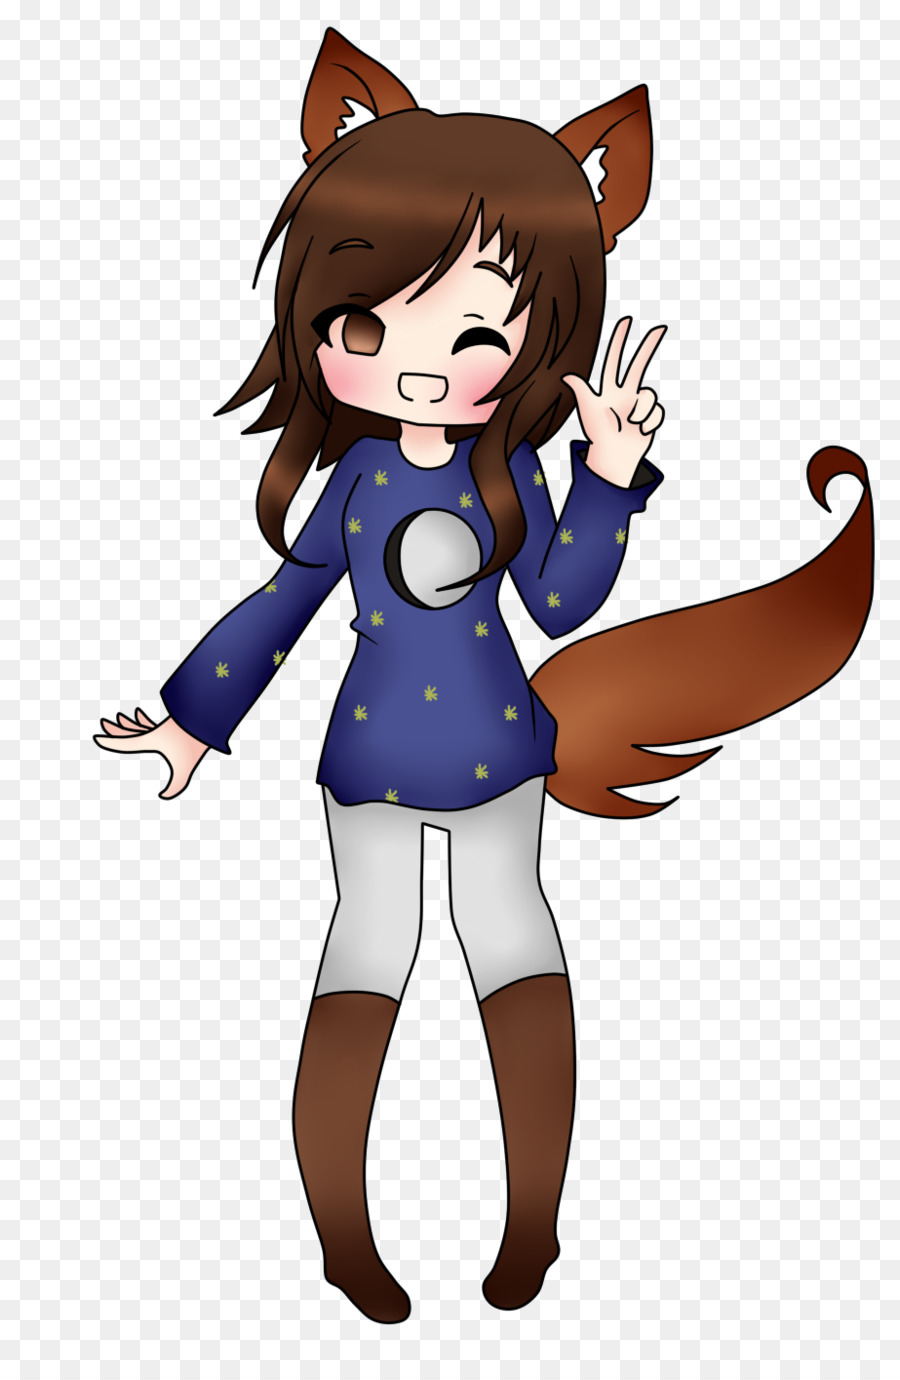 minecraft brown hair skin fox papercraft png download 923 1408